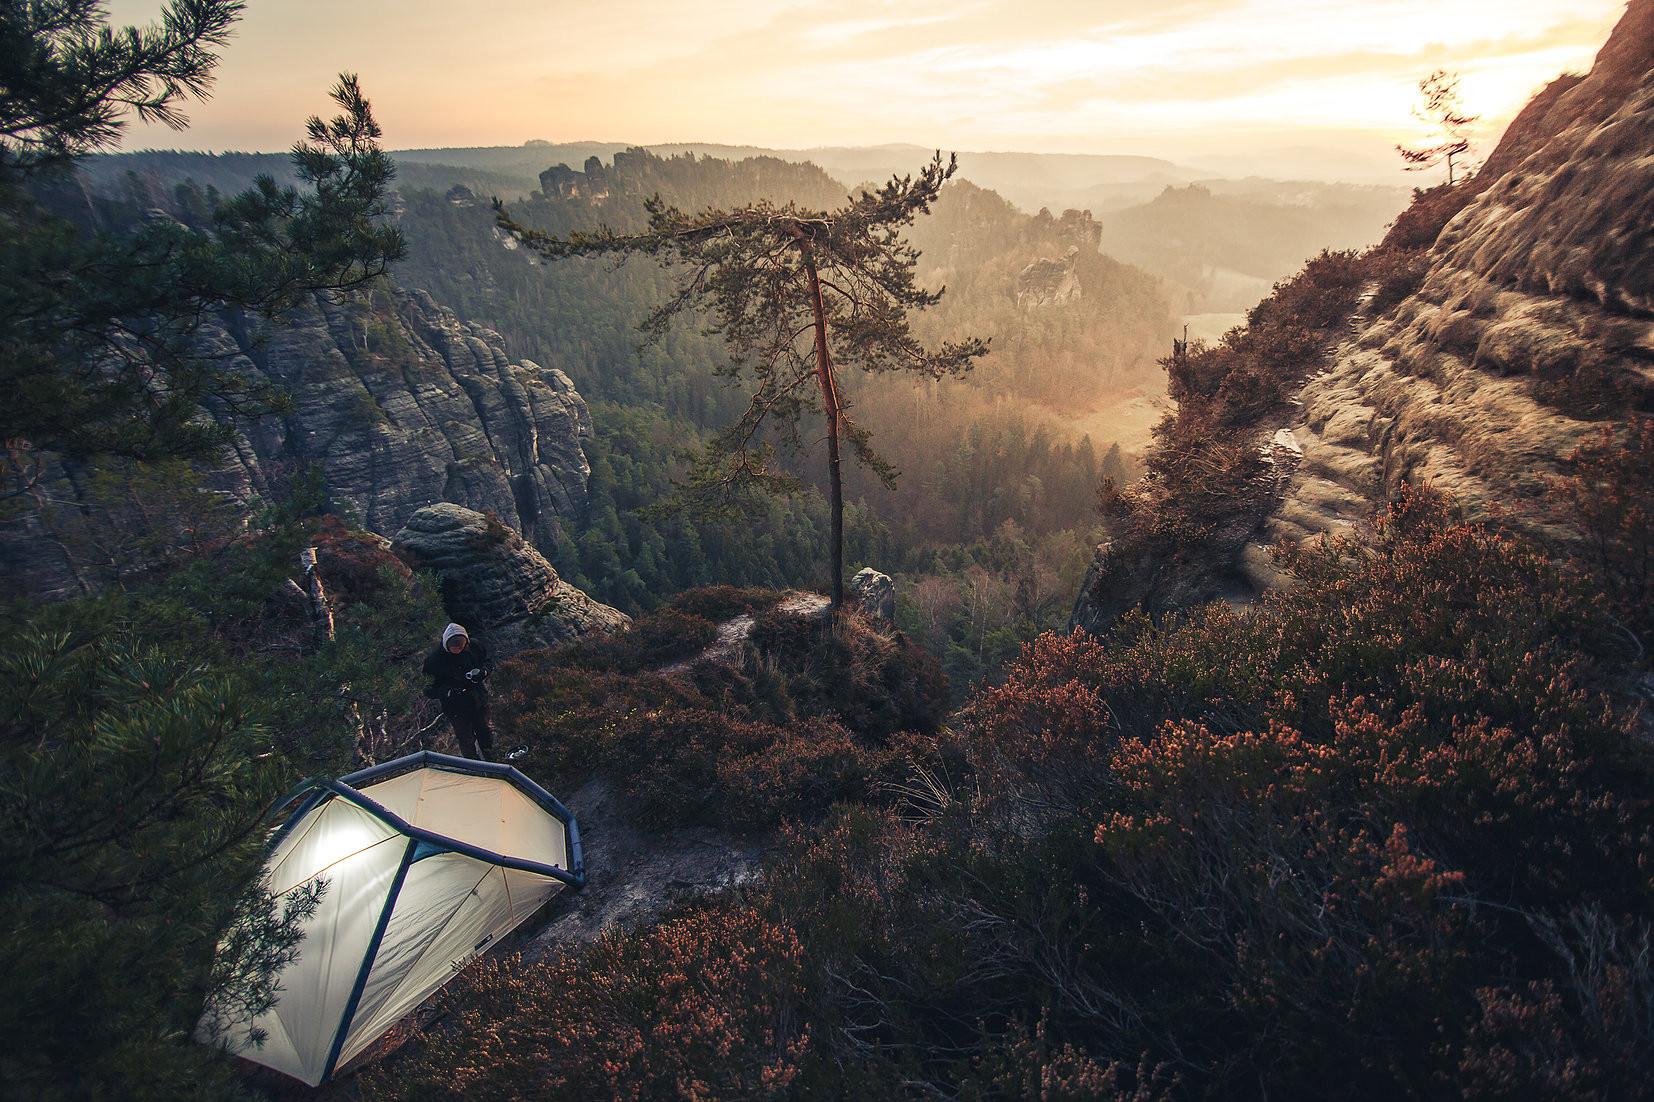 Explore our Blowup Tents